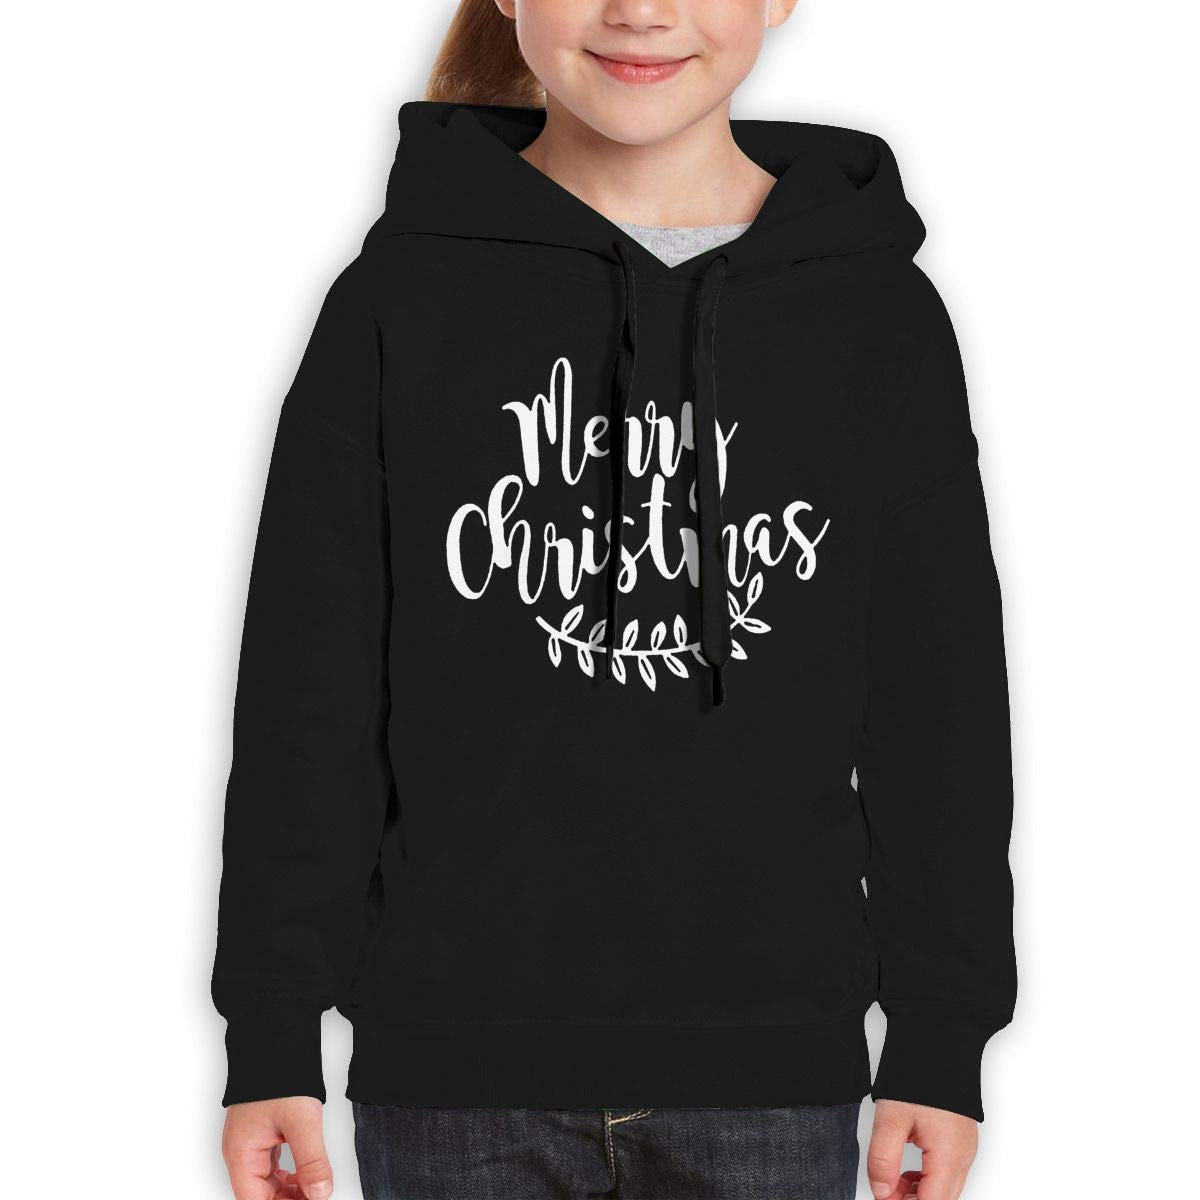 Boys Girls Merry Christmas Teen Youth Hoody Black